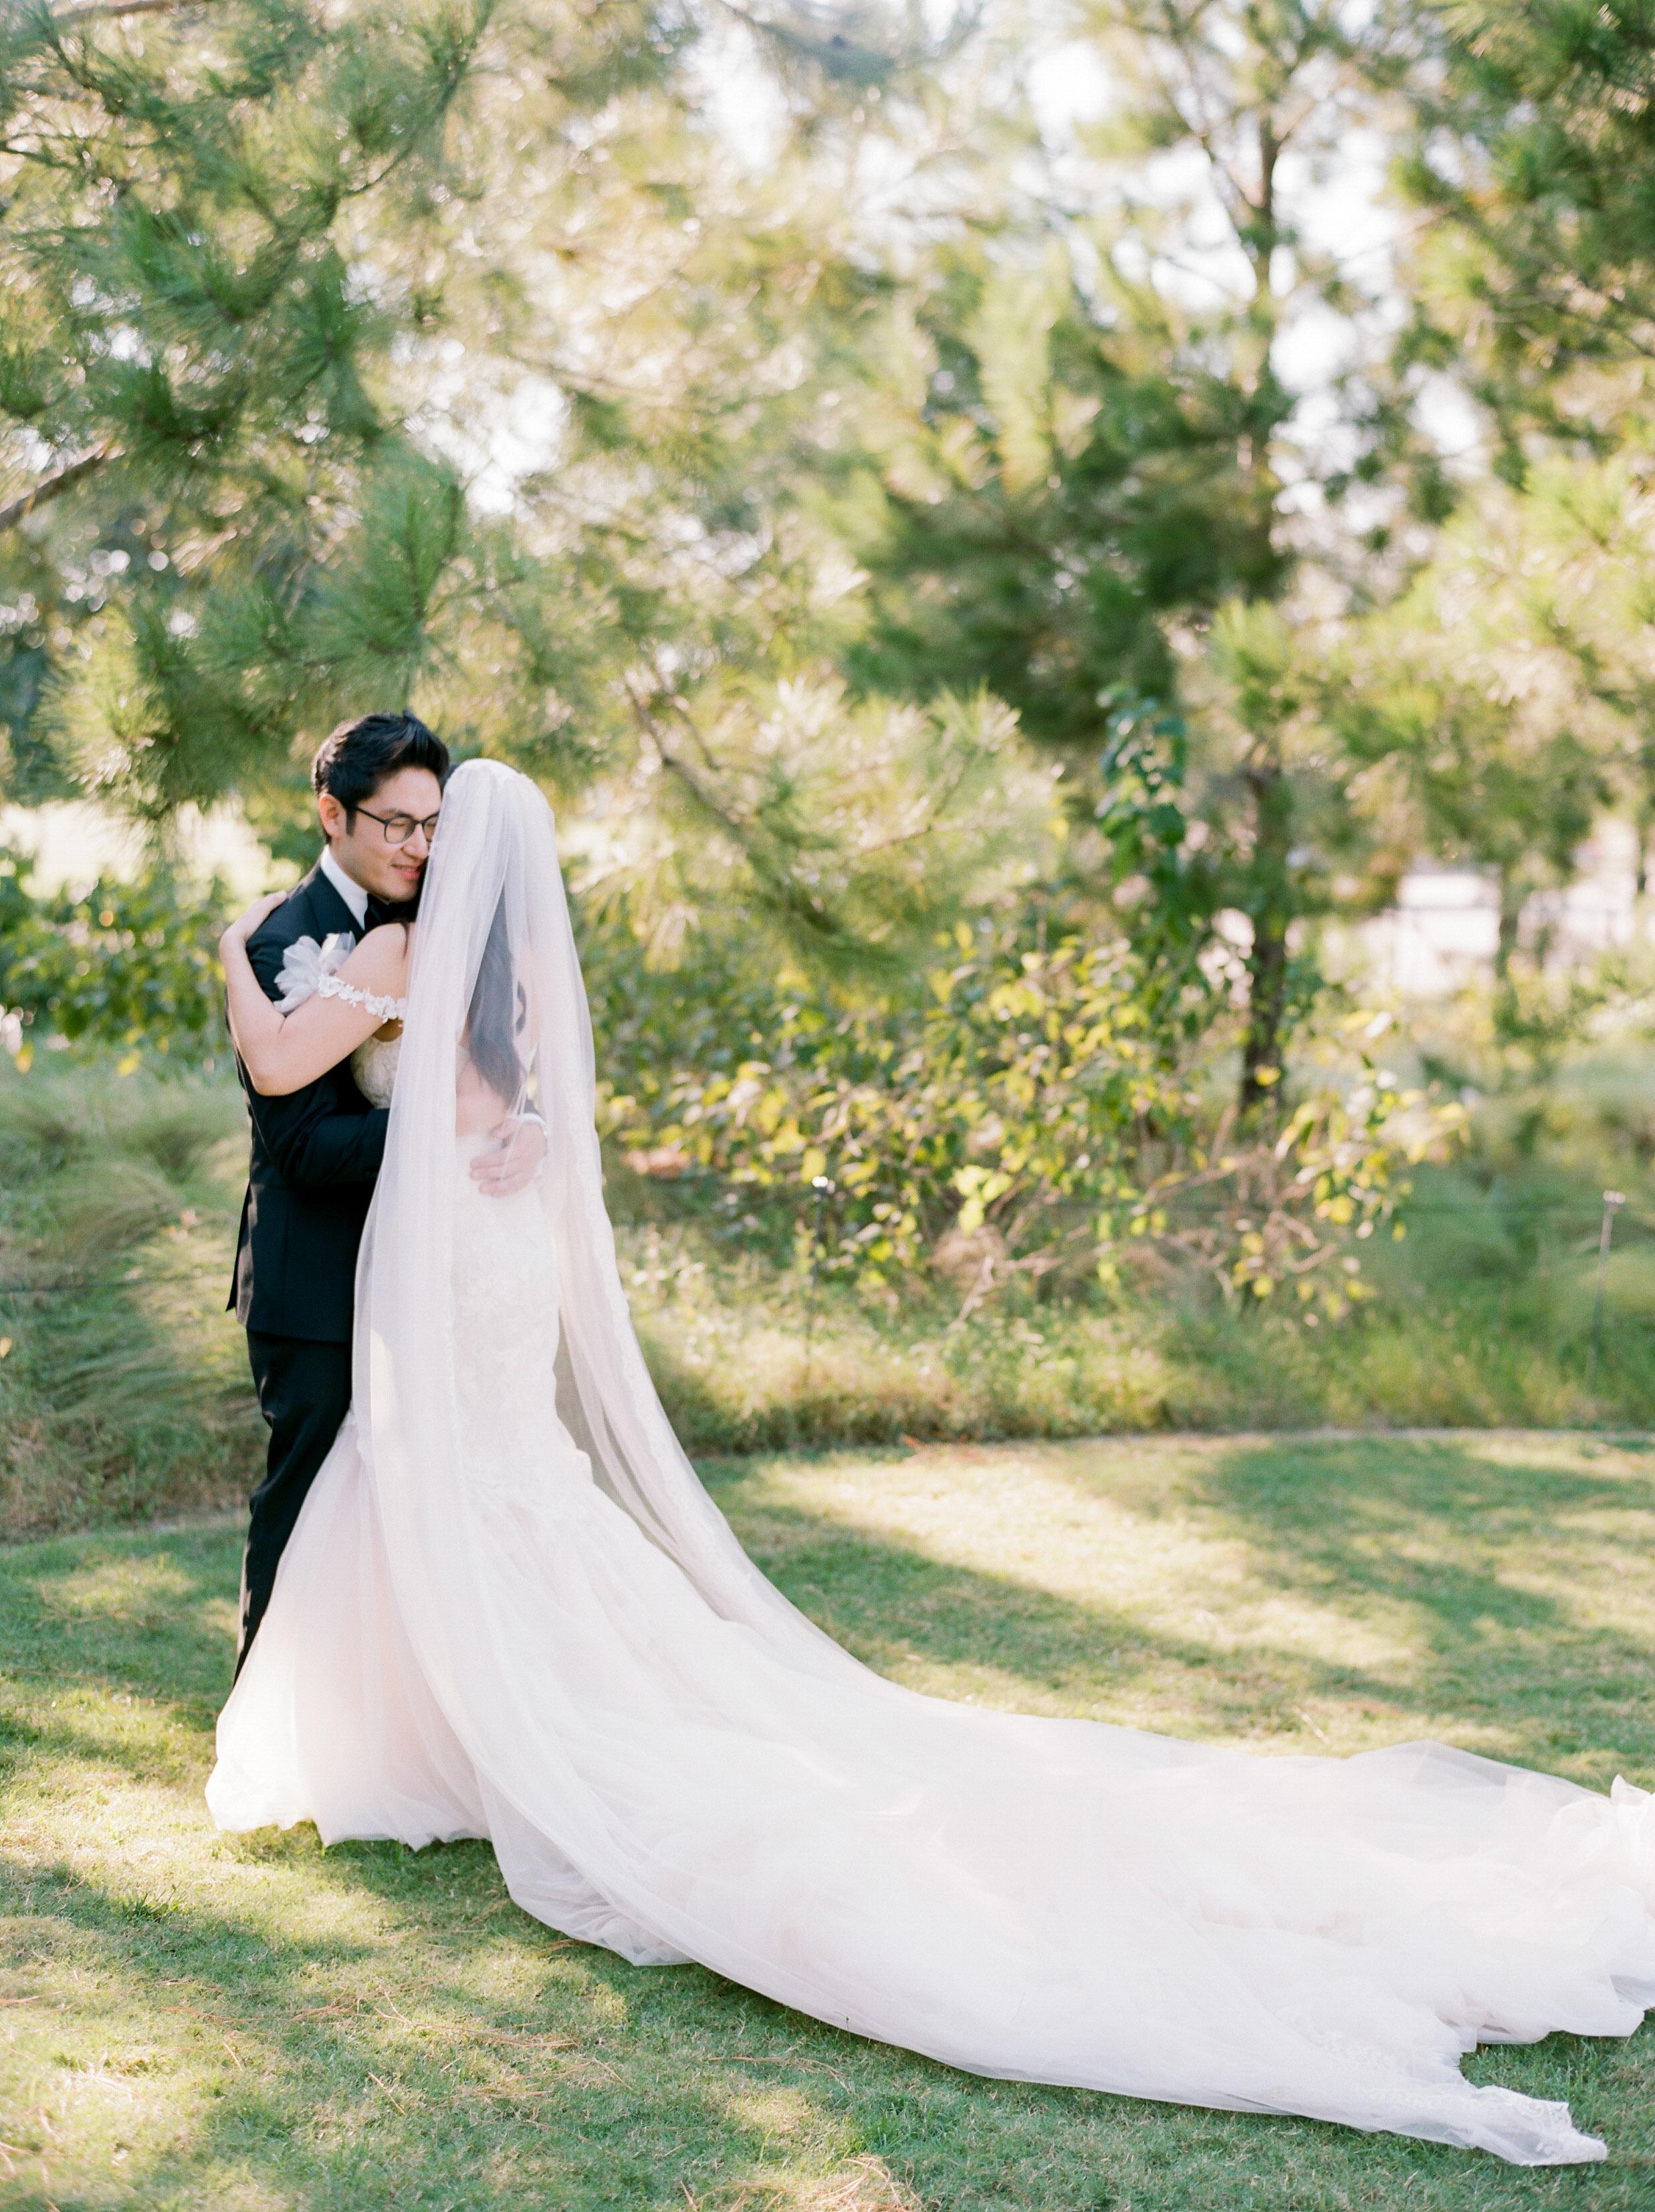 Martha-Stewart-Wedding-Dana-Fernandez-Photography-Josh-Texas-Film-Houston-Wedding-Fine-Art-Photographer-McGovern-Centennial-Gardens-Top-Best-164.jpg